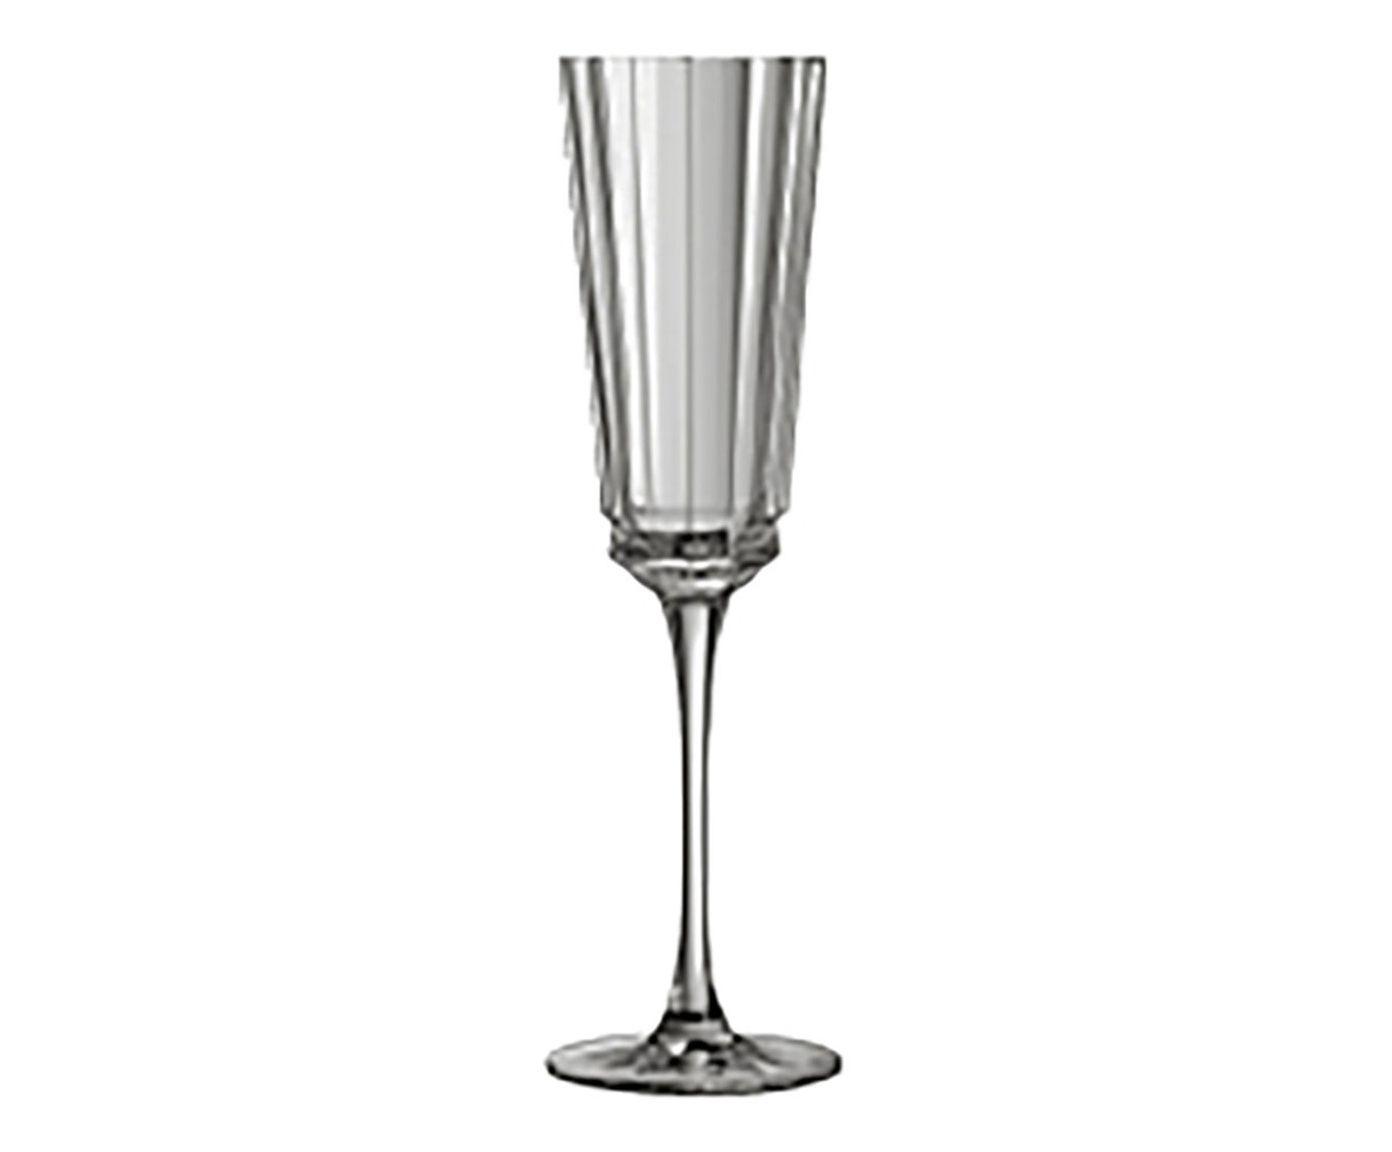 Taça para Champagne Macassar - 170ml | Westwing.com.br